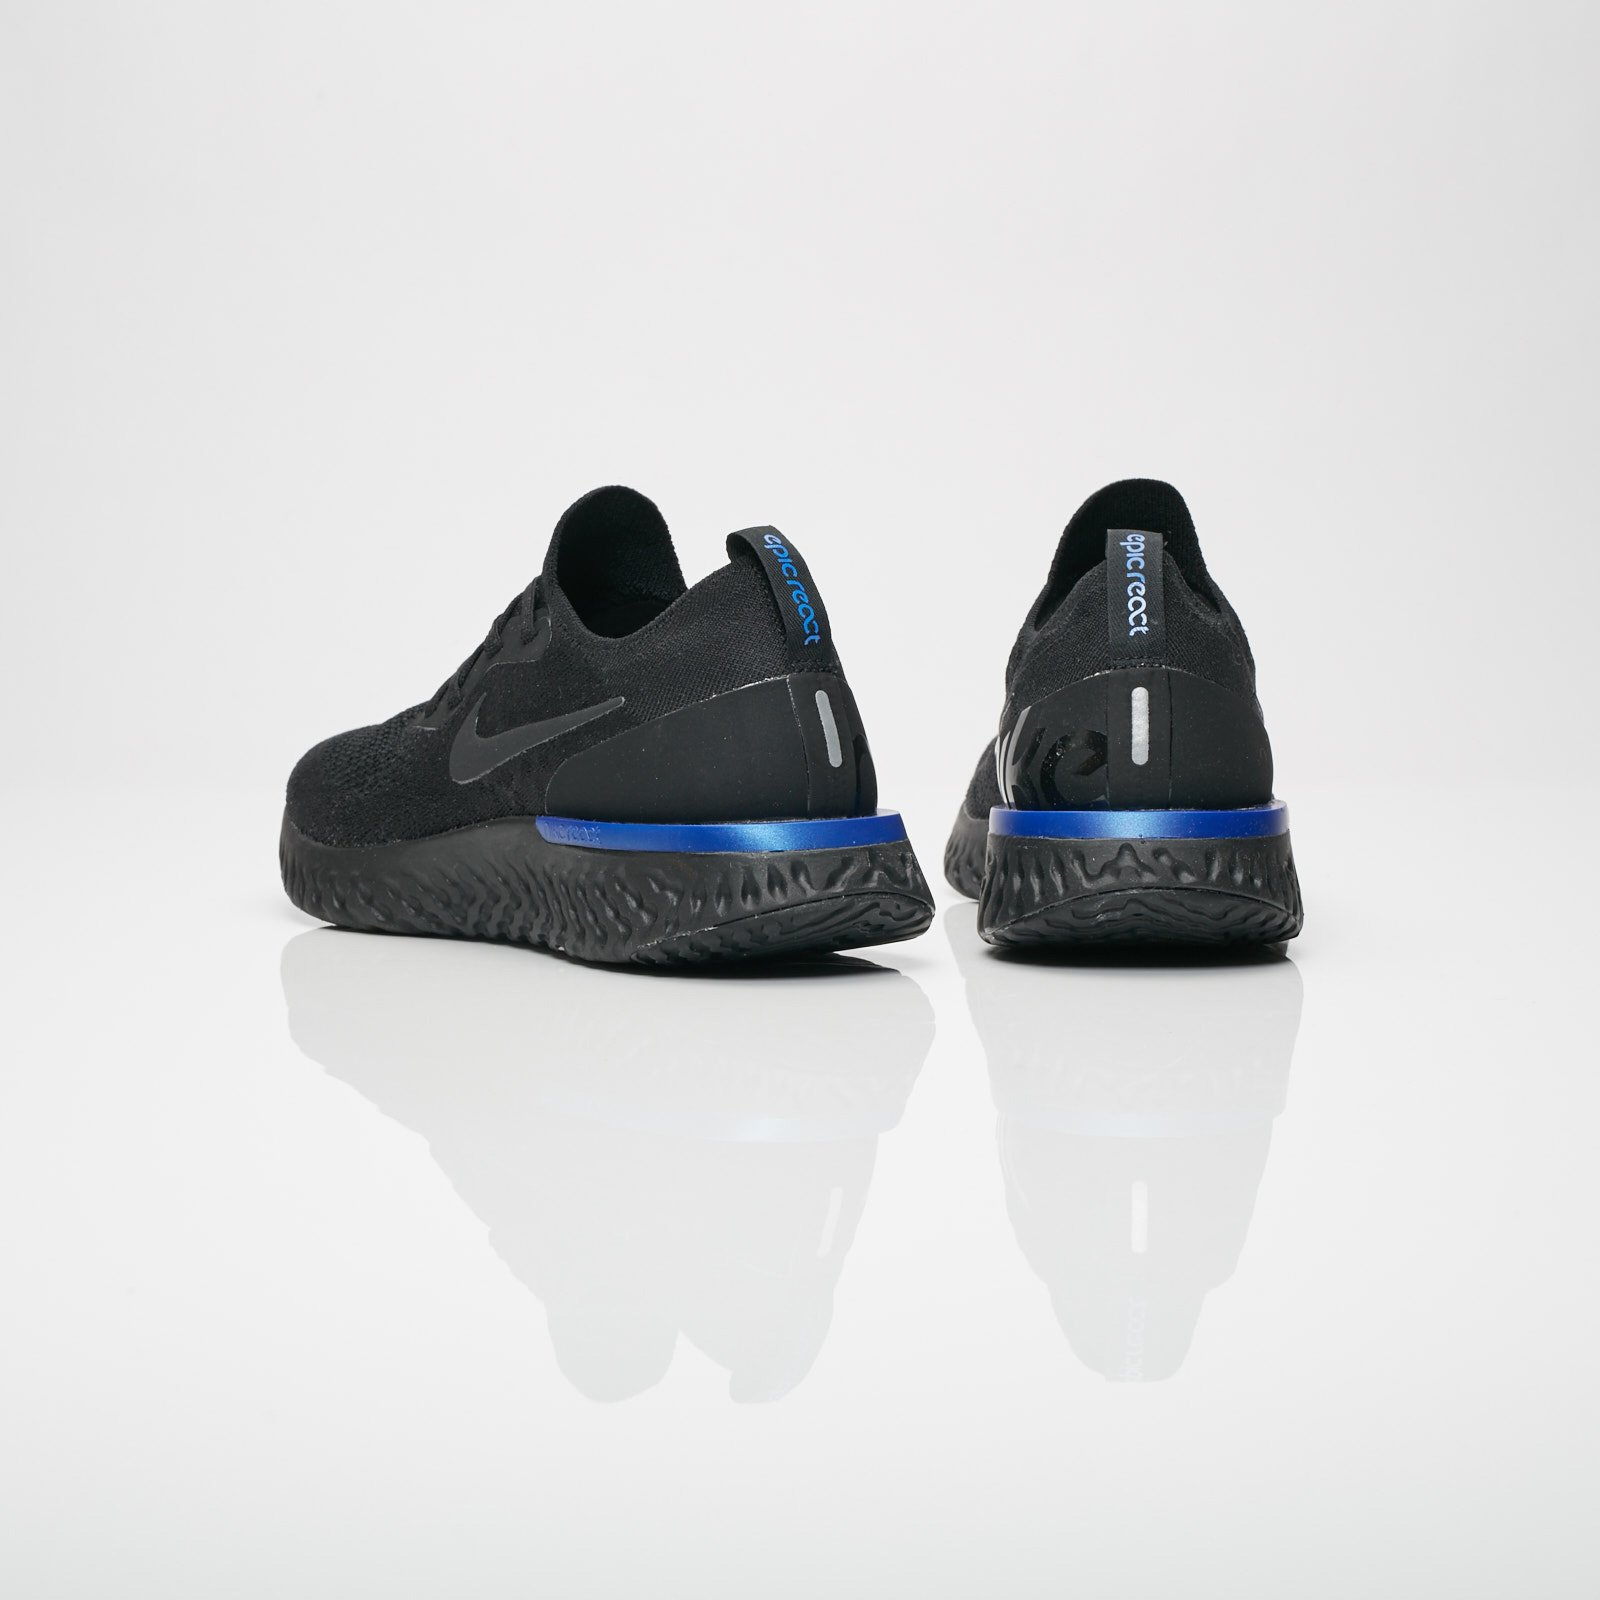 d2872e46372be Nike Epic React Flyknit - Aq0067-004 - Sneakersnstuff